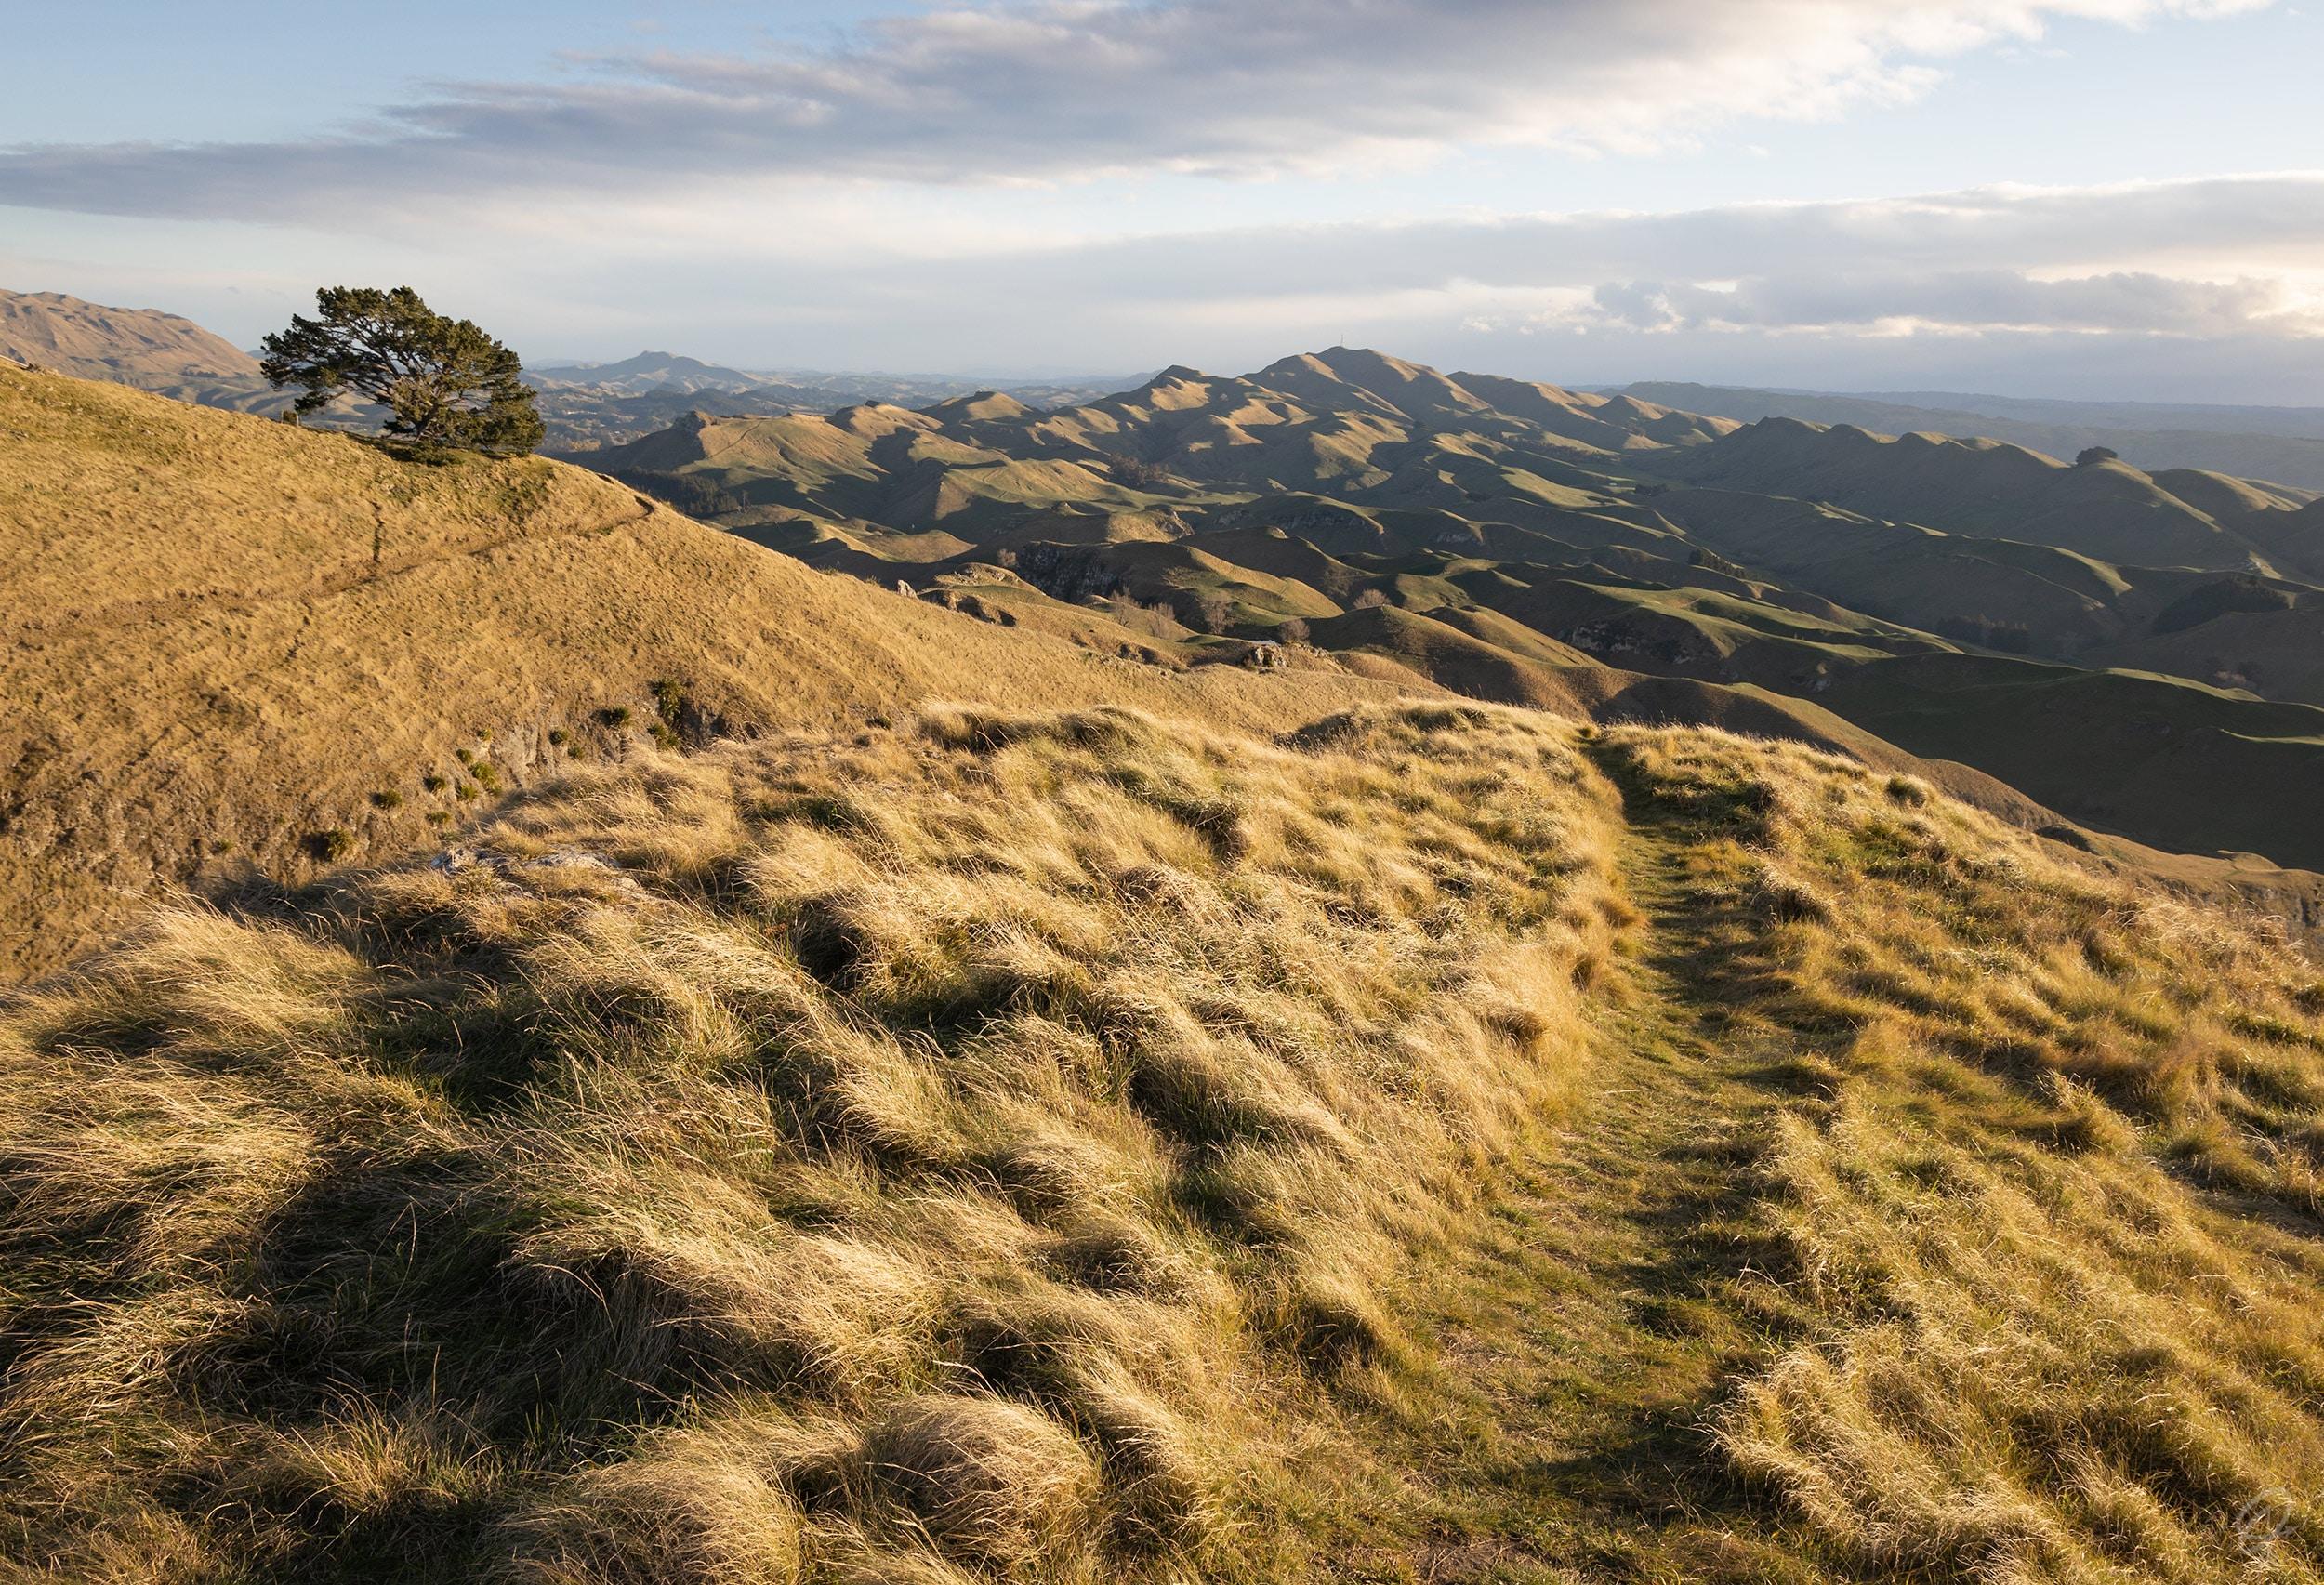 gold grassy hills